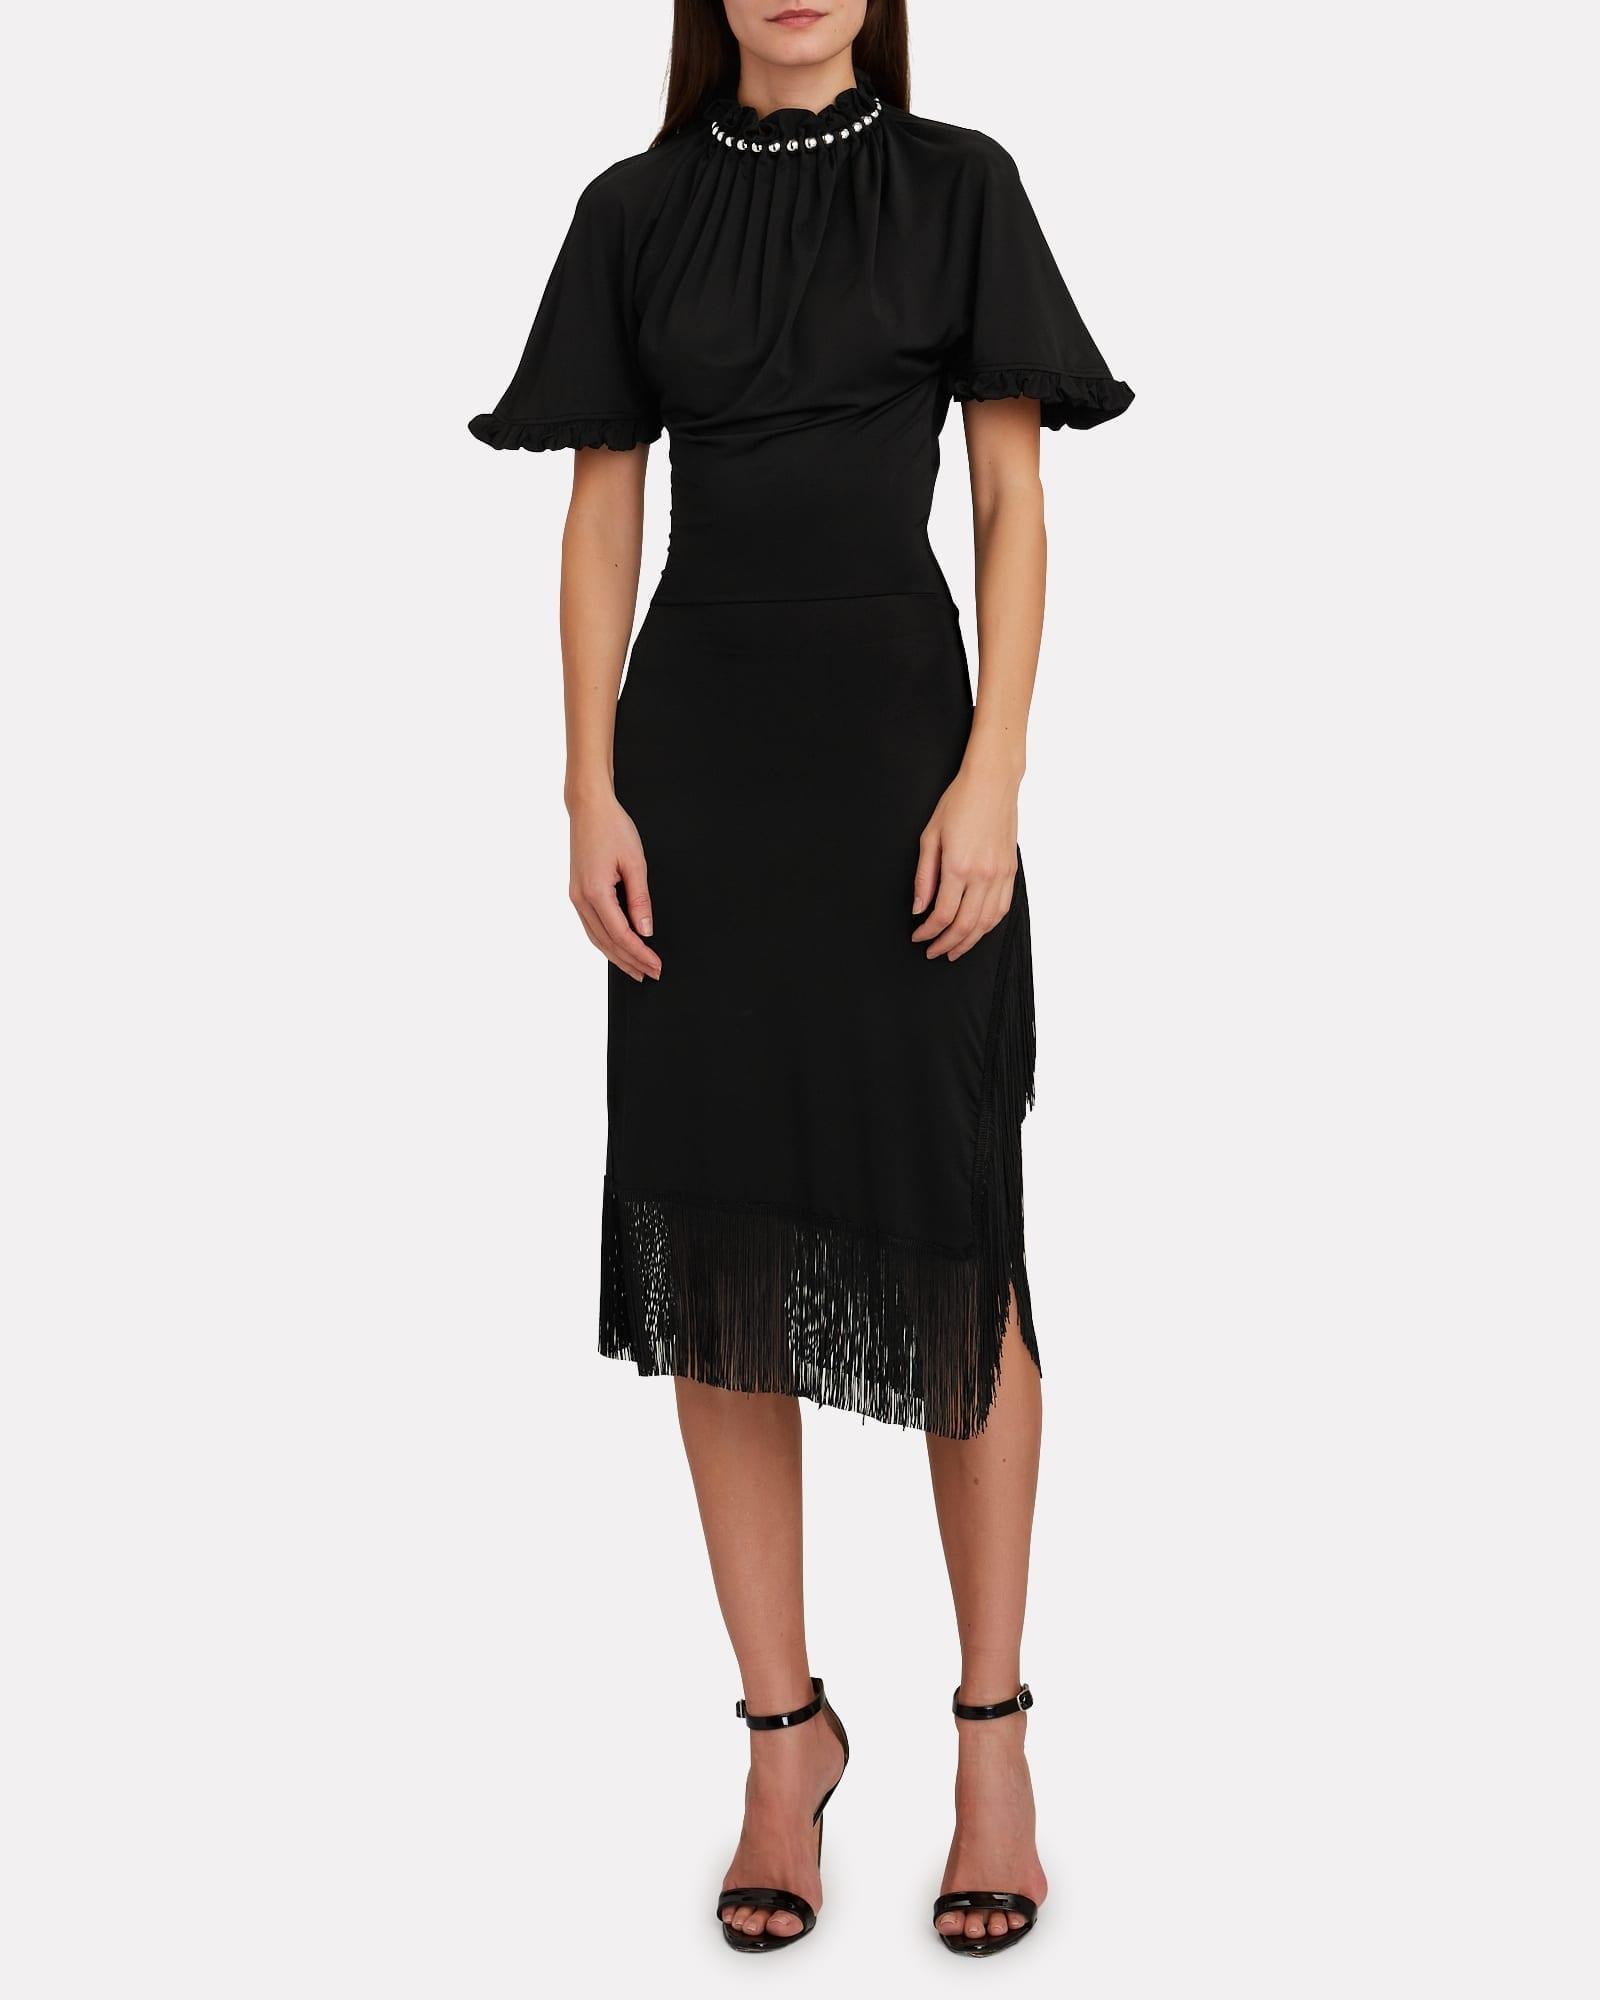 PACO RABANNE Fringe-Trimmed Midi Dress